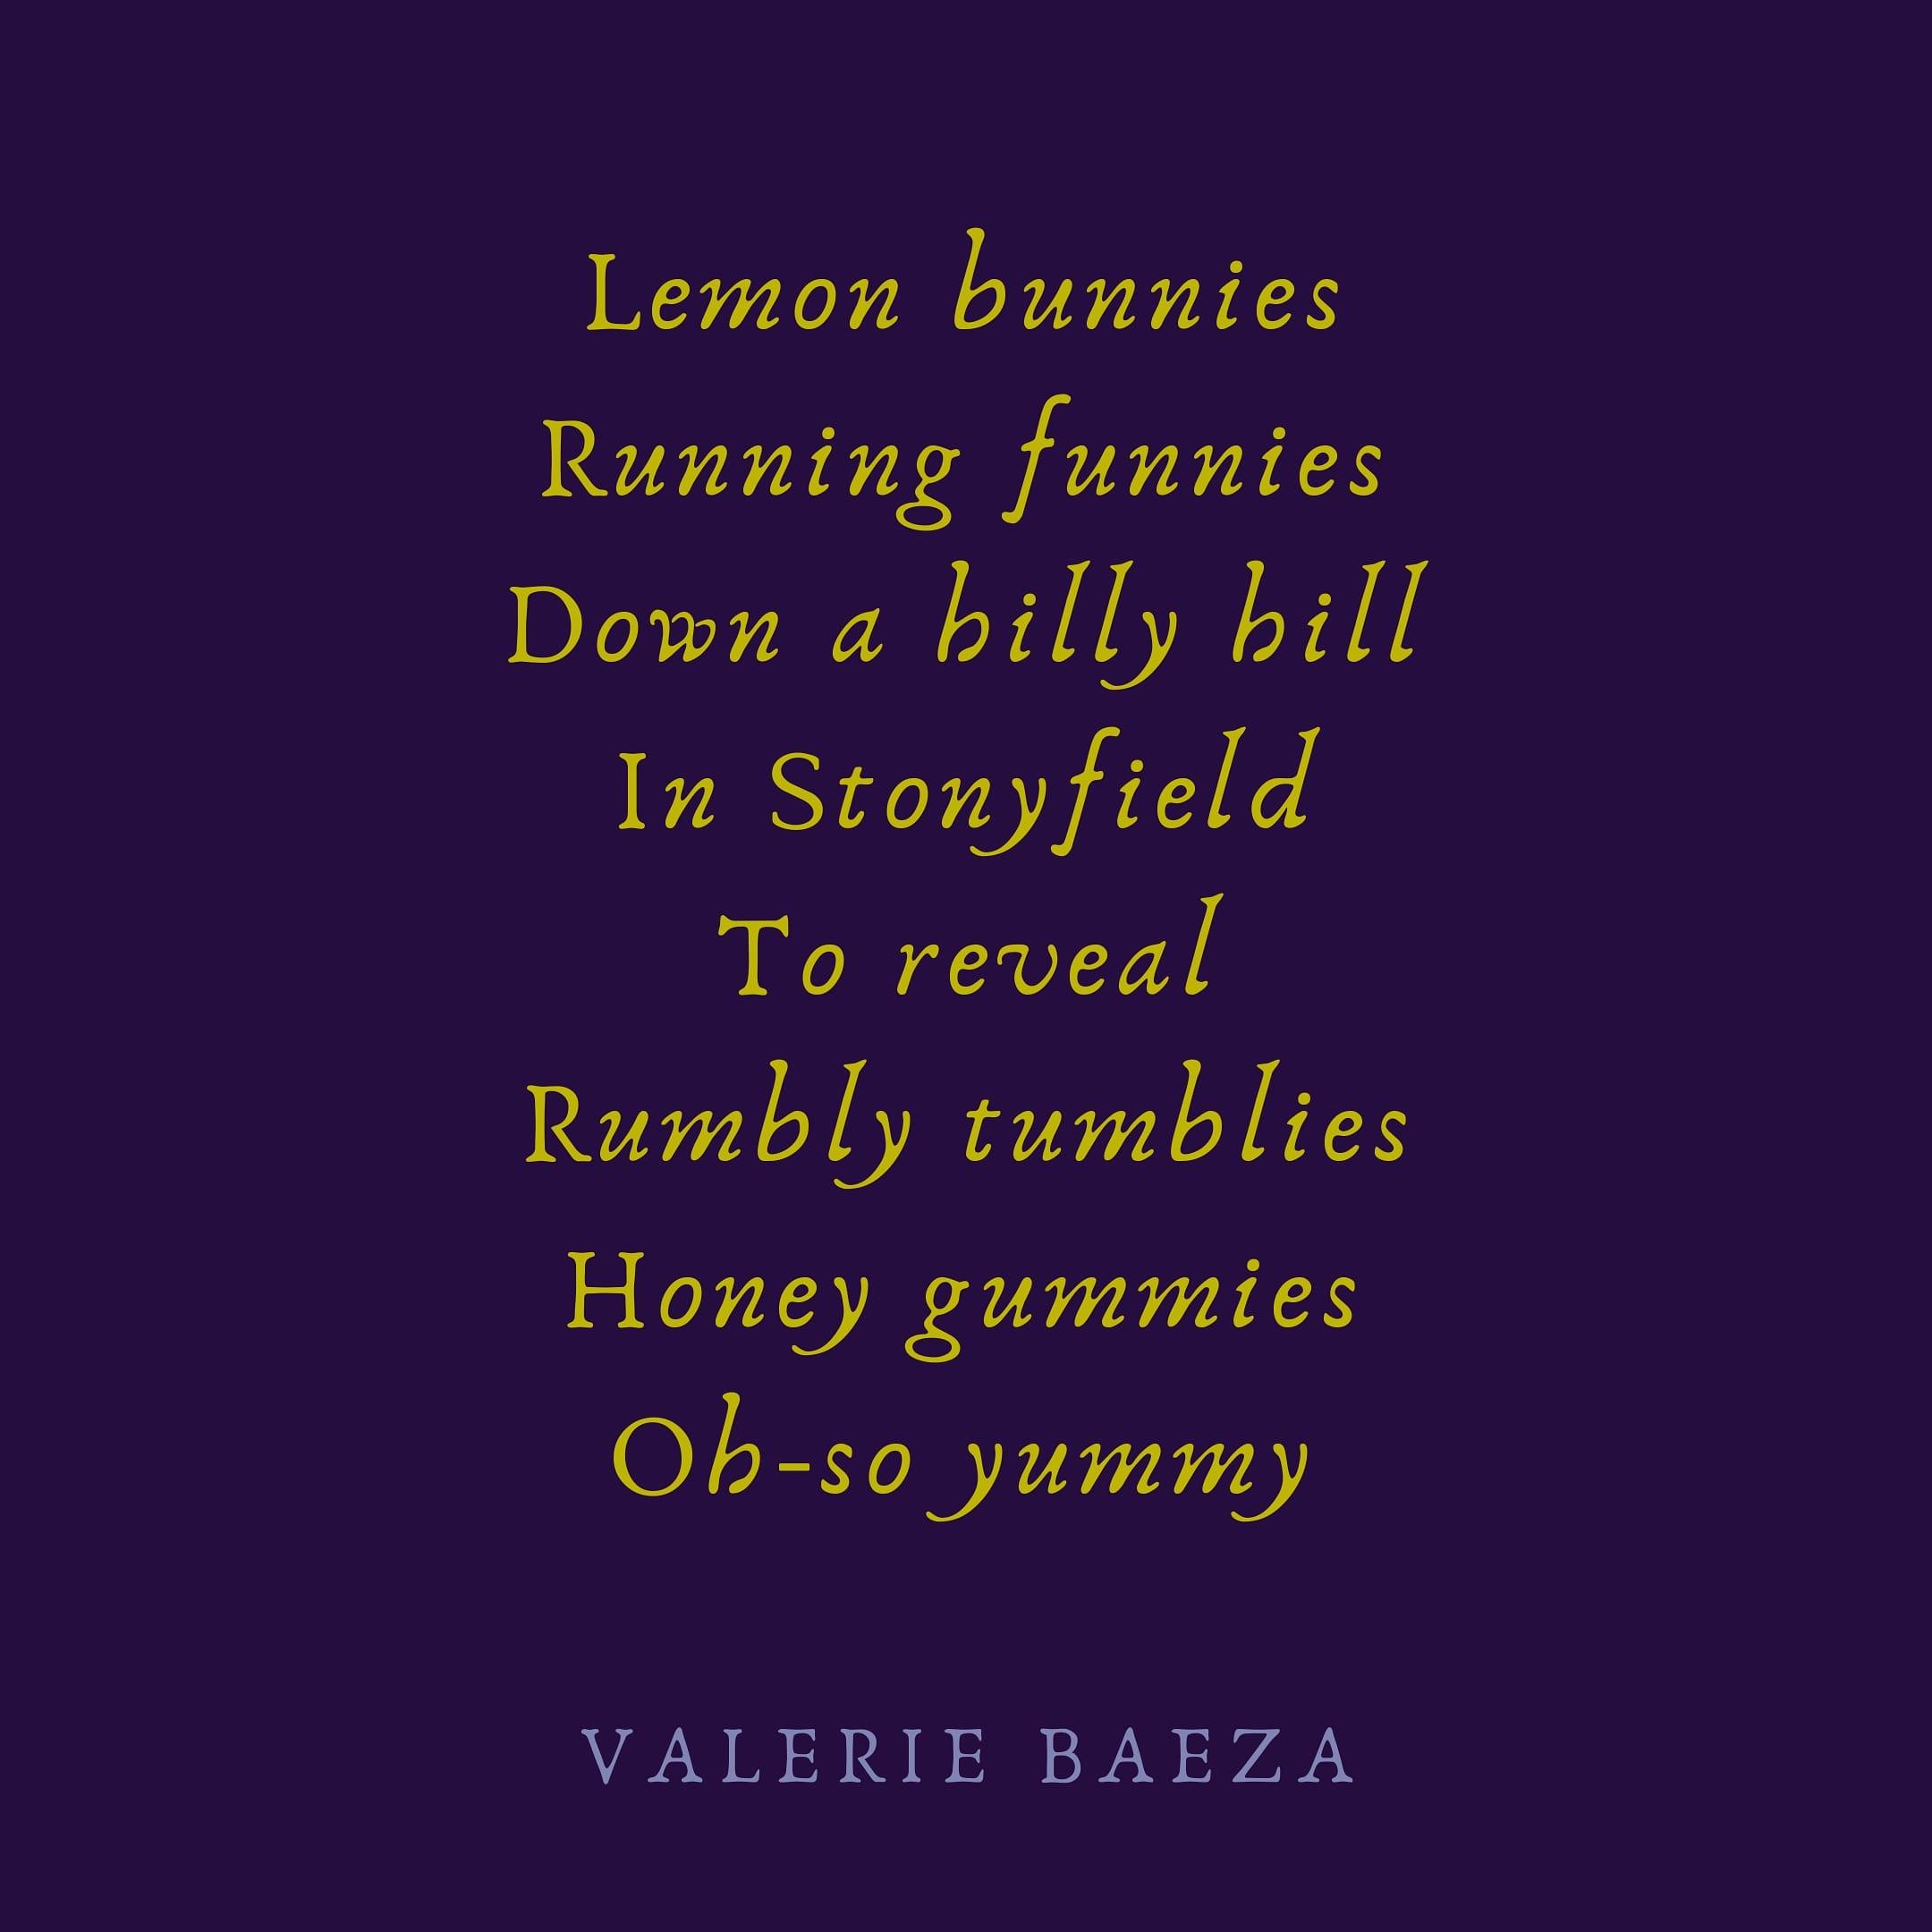 Lemon Bunnies by Valerie Baeza